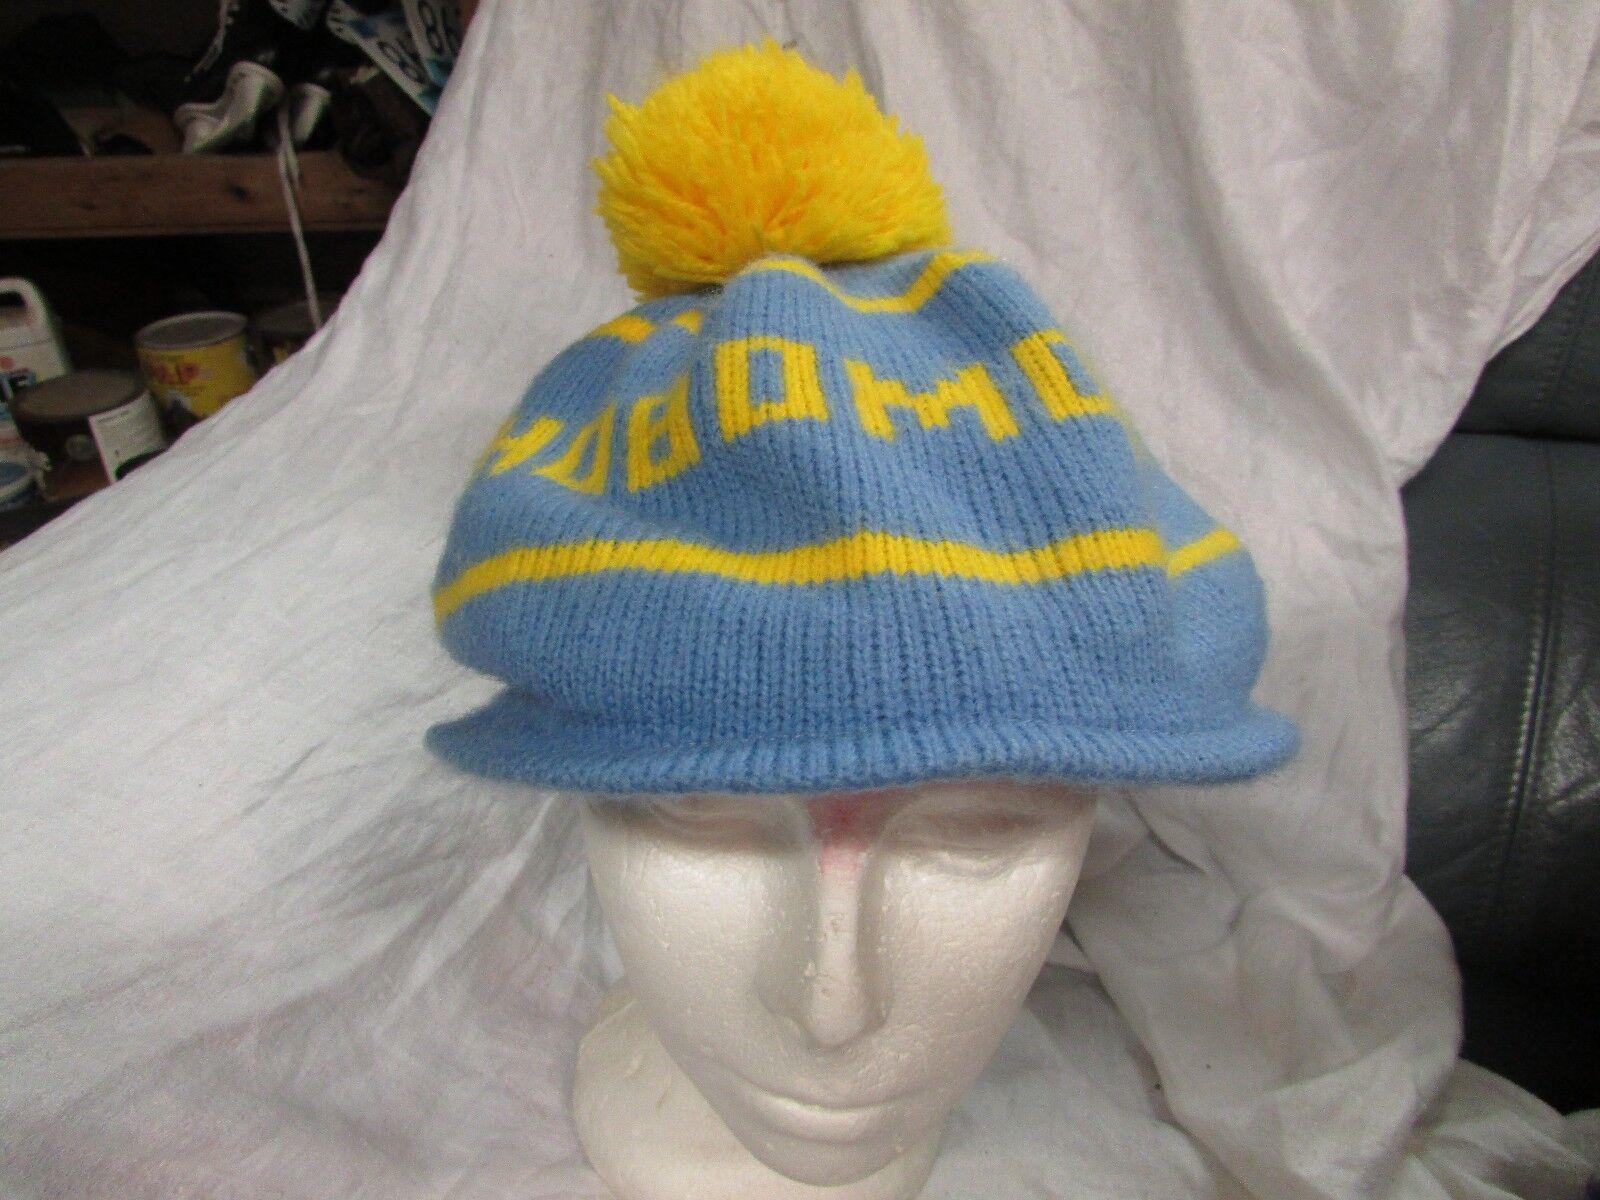 vintage stocking hat HOBOMOCK BLUE pom pom 1970 1980s ski retro tuque cap beanie